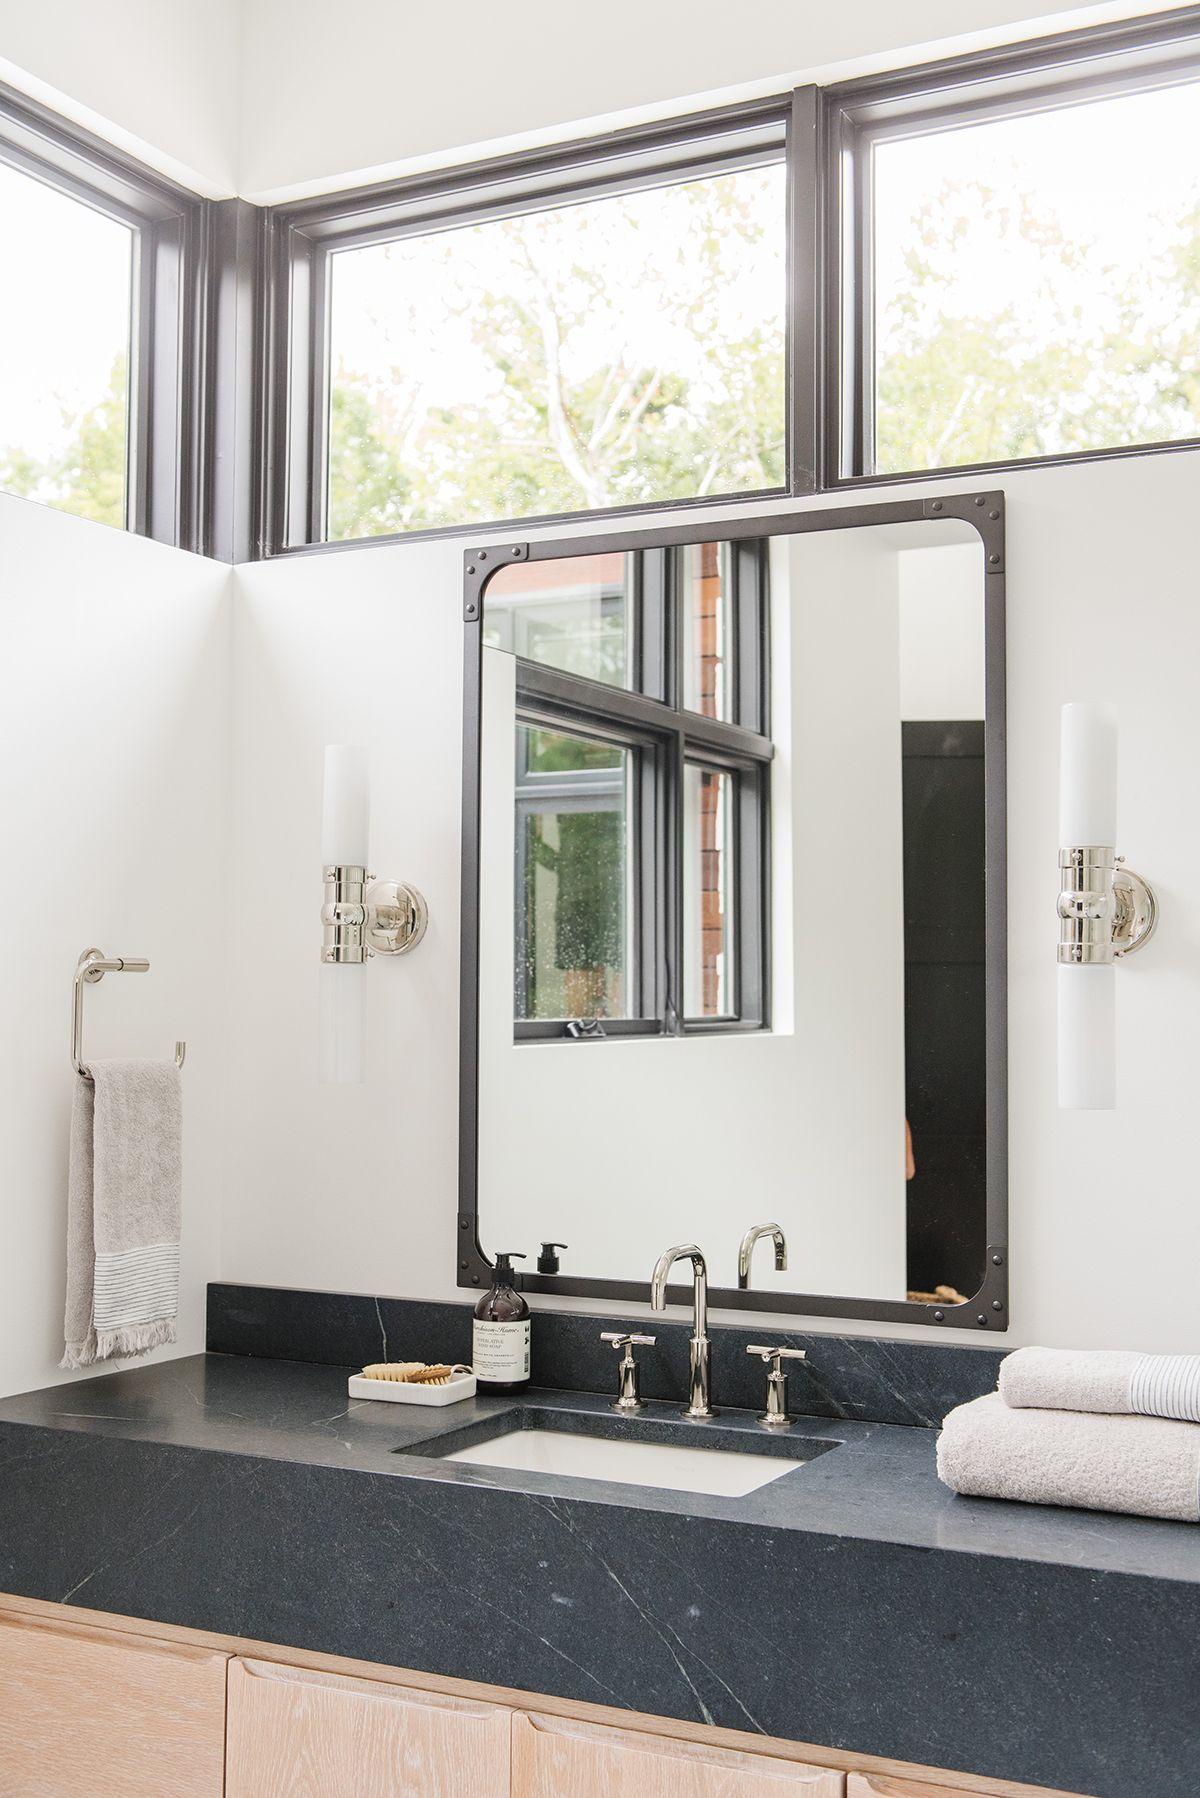 Modern Lake House Bonus Rooms Photo Tour With Images Basement Bathroom Design Modern Lake House Small Basement Design